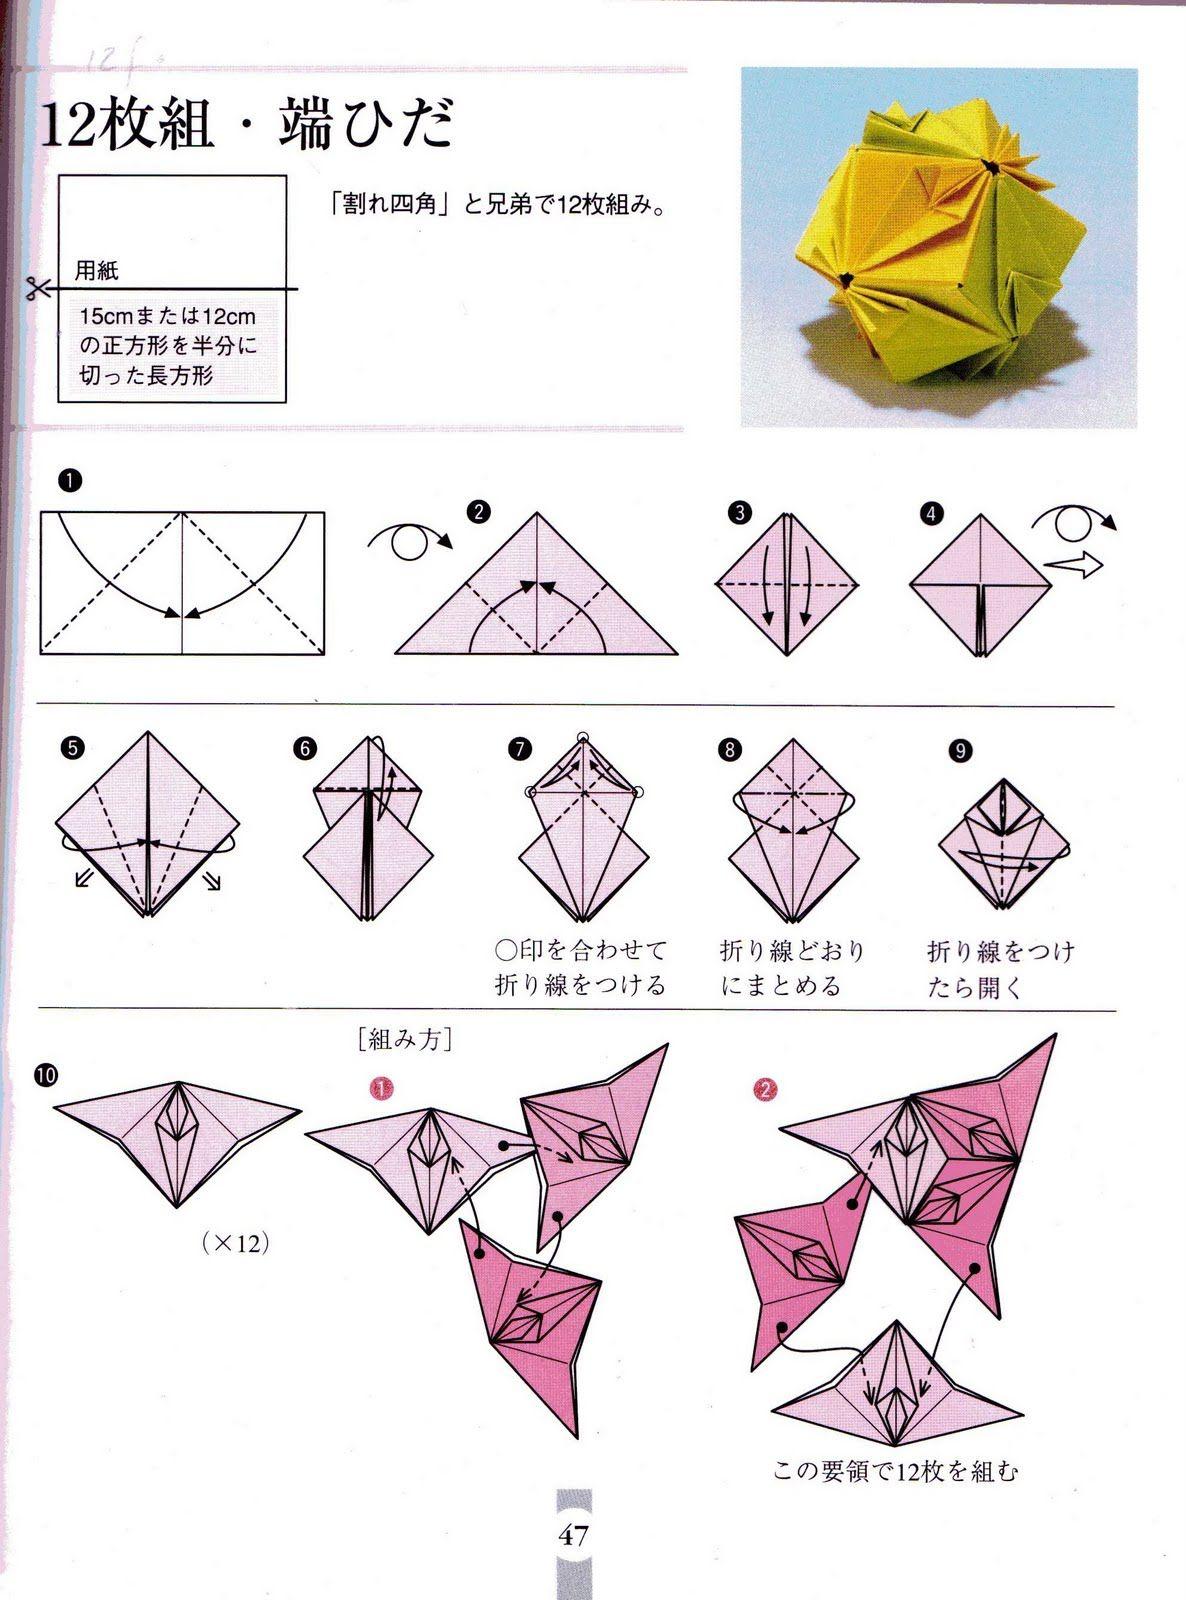 kusudama ball diagram msd 7al 2 wiring cubo 01 Кубики pinterest origami craft and crafty